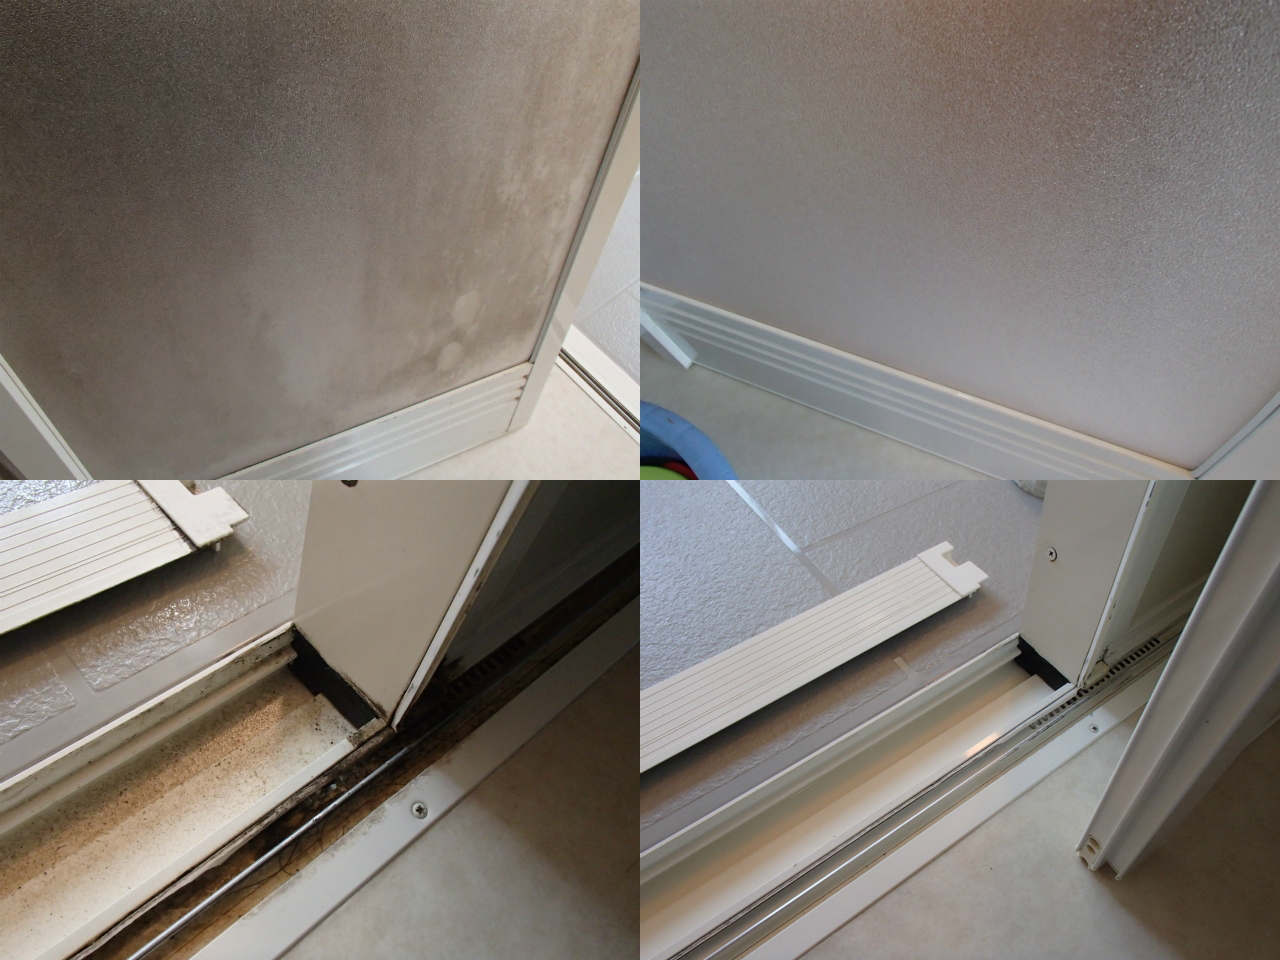 http://ajras.net/images/121112-bathroom1.jpg